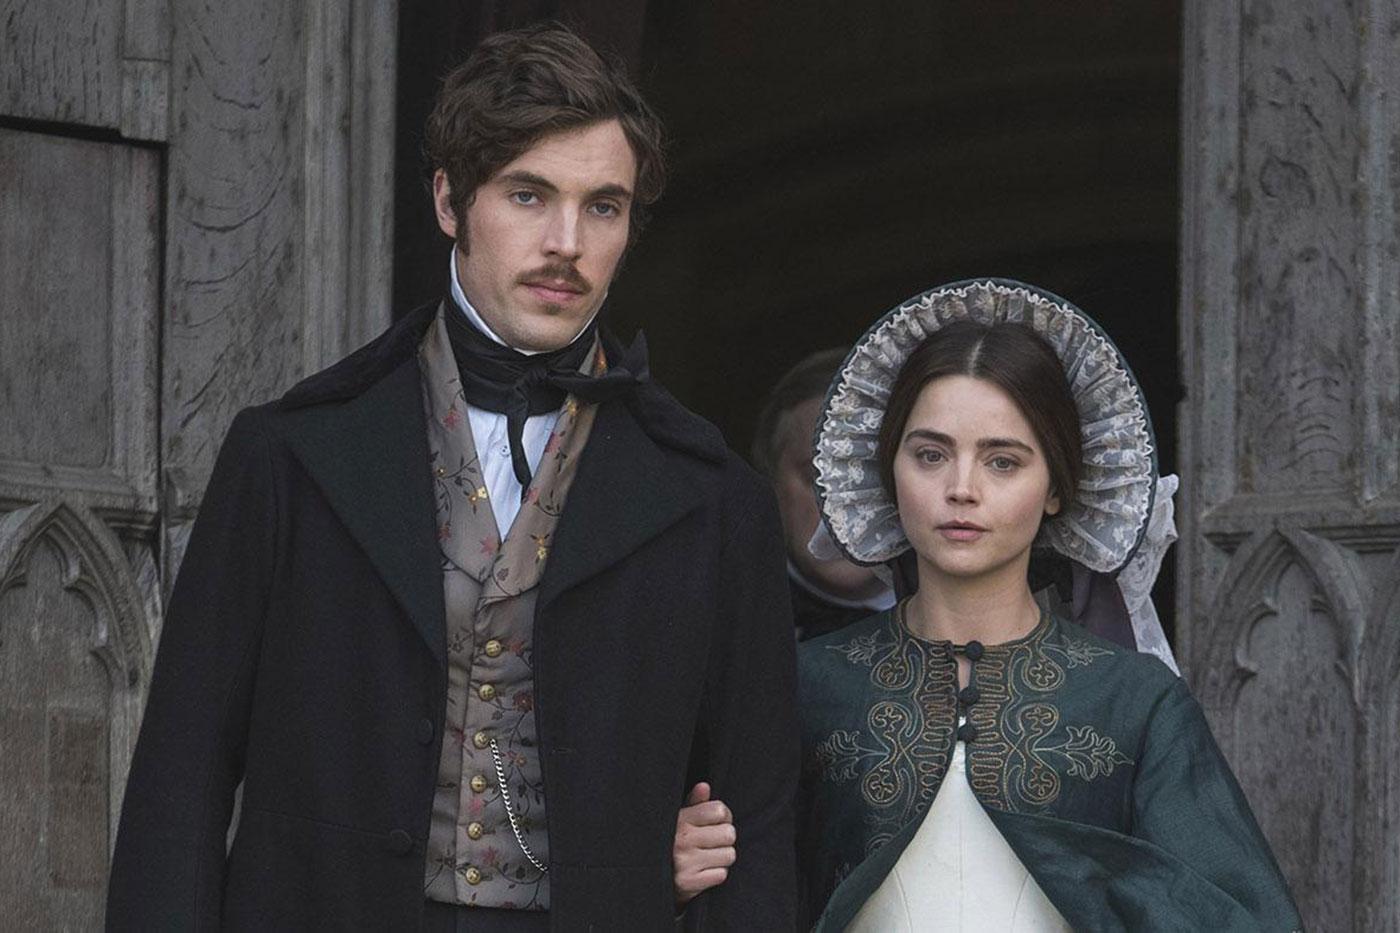 Prince Albert and Victoria. Photo: Courtesy of ITV Studios